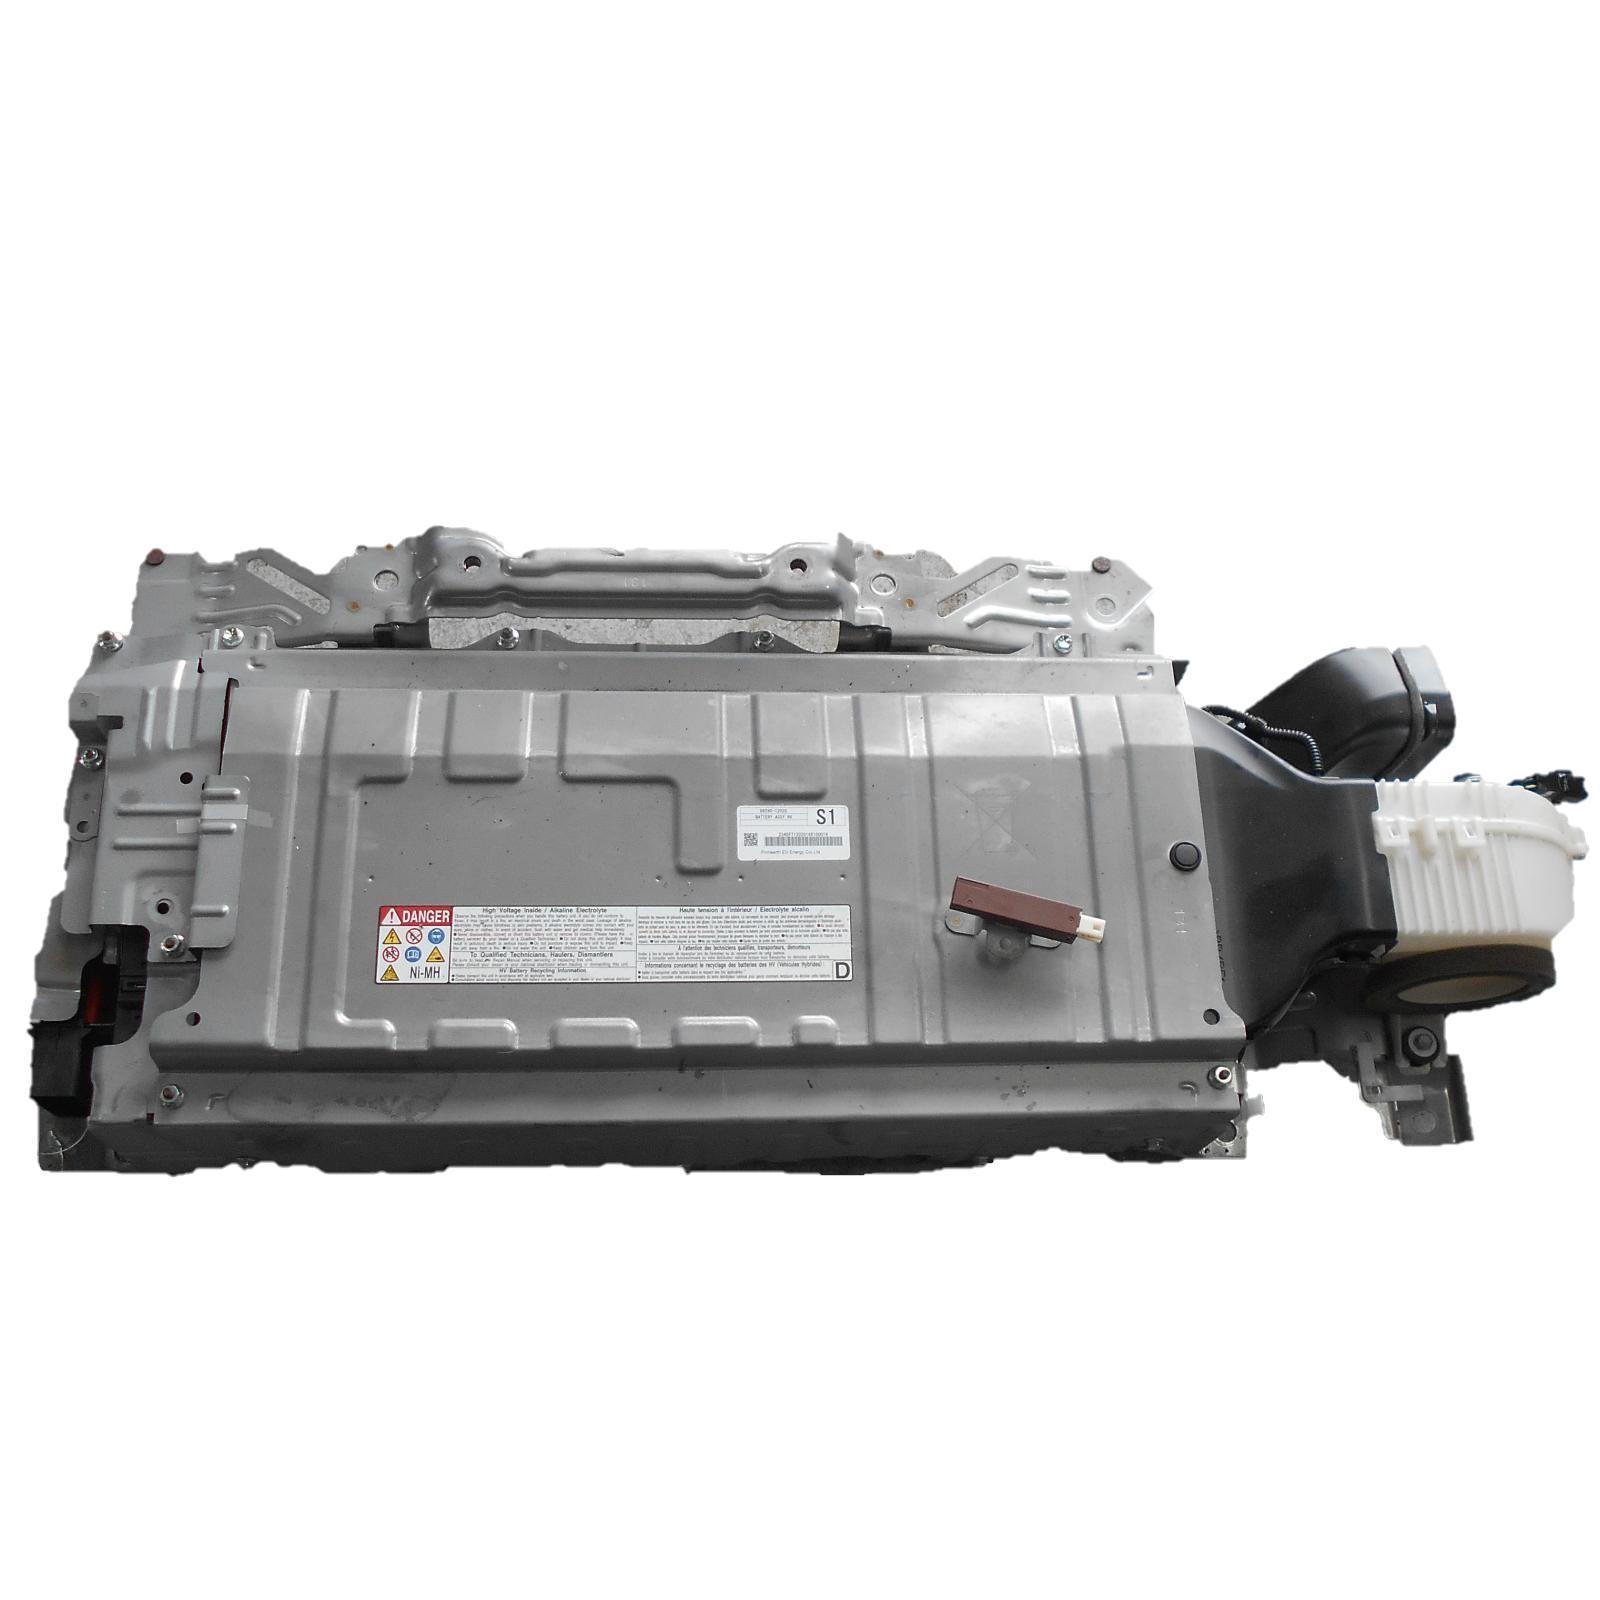 TOYOTA COROLLA, High Voltage Battery, HYBRID BATTERY, 201.6 VOLT, (UNDER REAR SEATS), ZWE186R, 06/16-